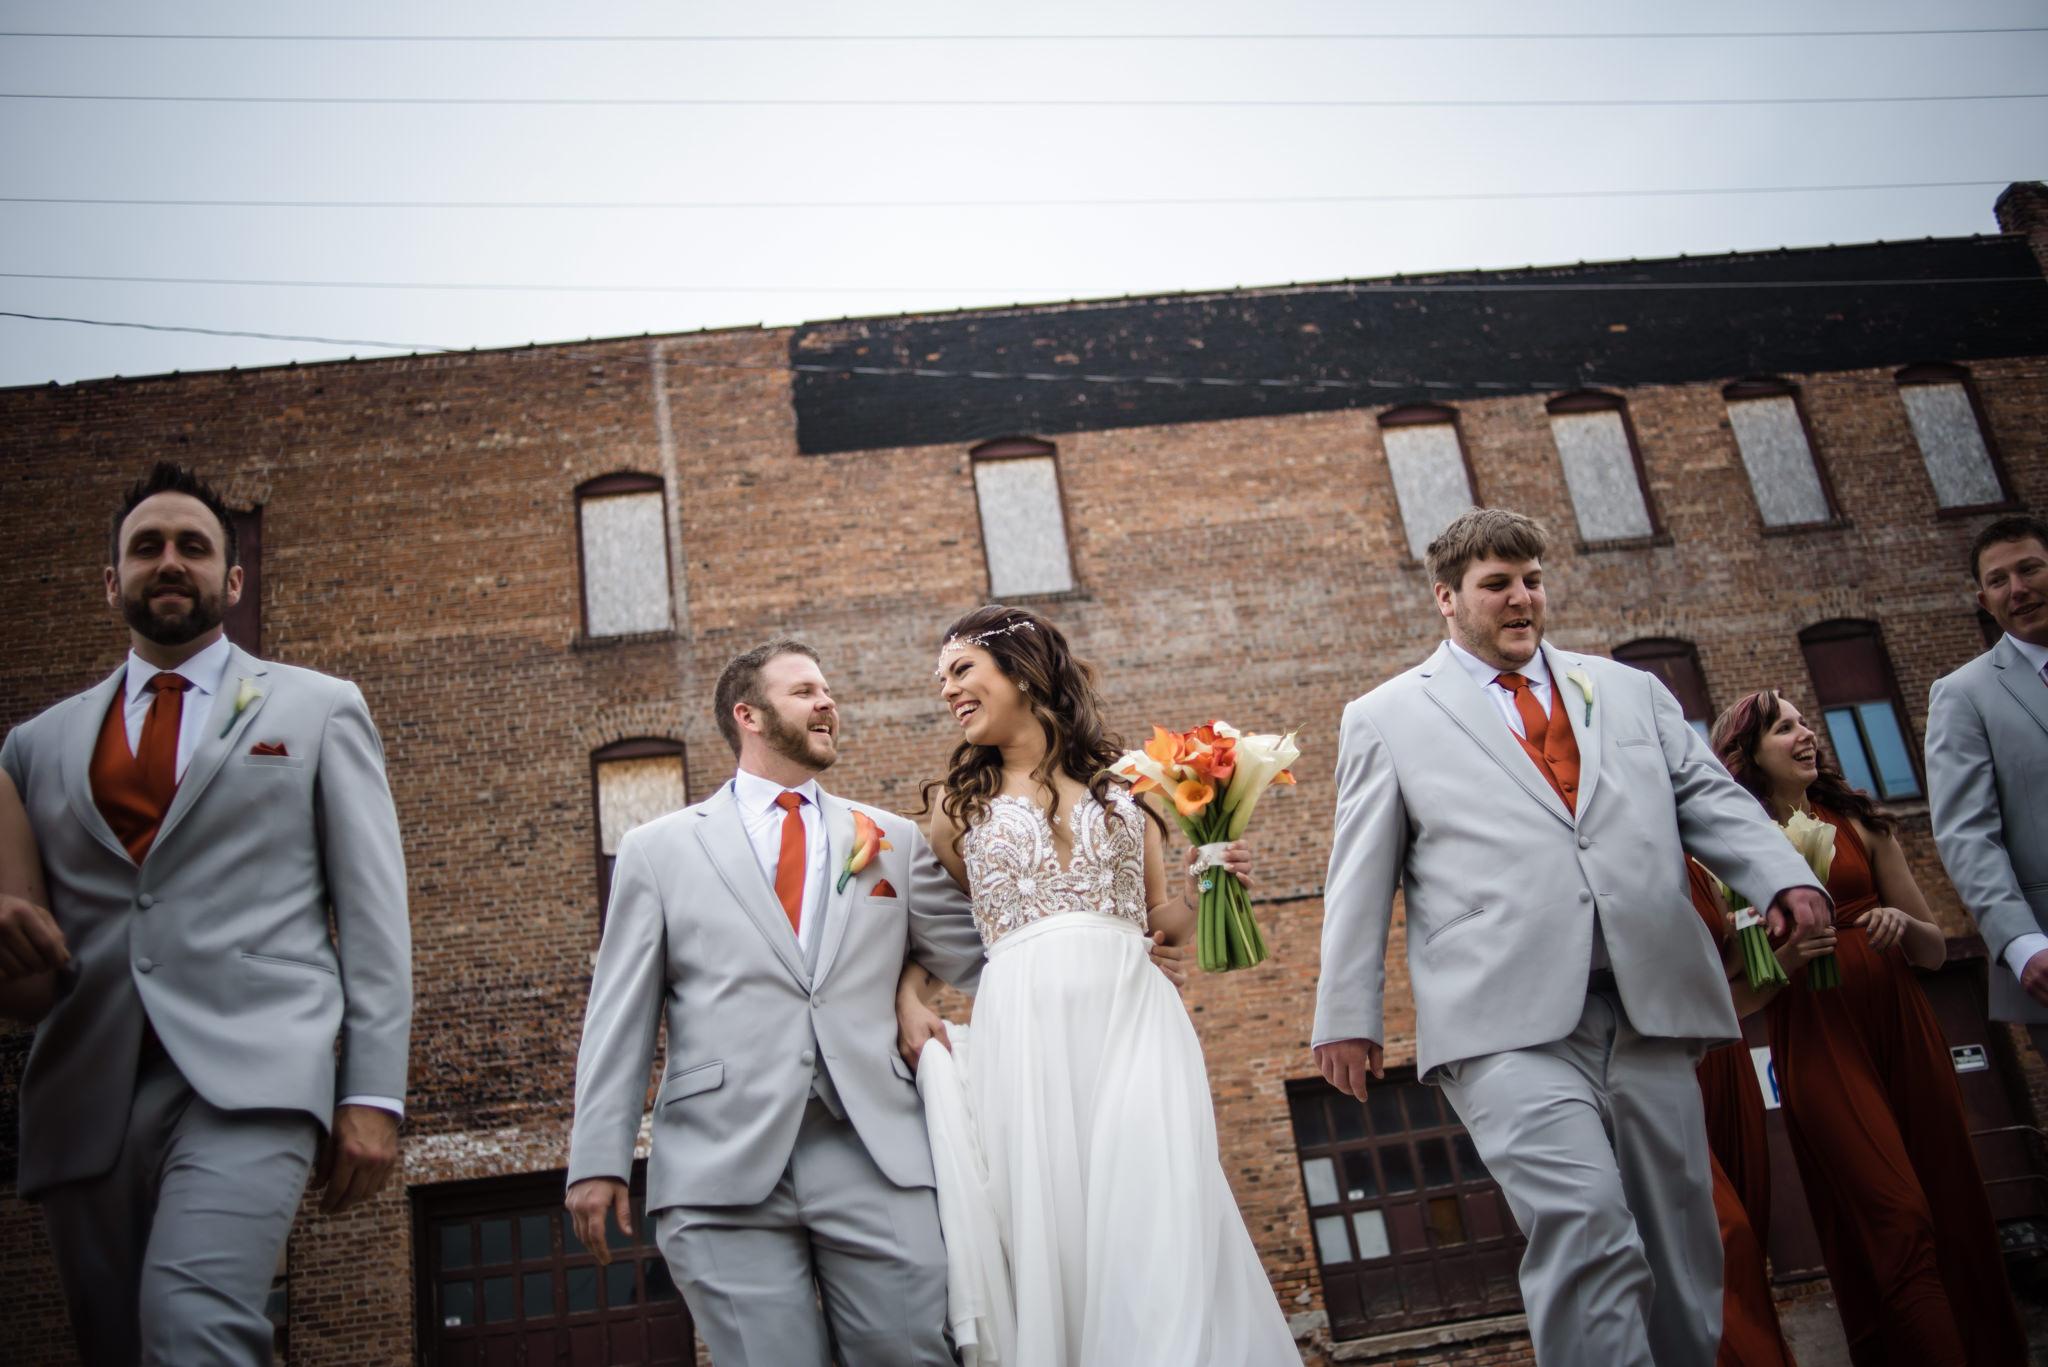 HILTON-OMAHA-WEDDING-PHOTOGRAPHER-JM-STUDIOS-OMAHA-LIV-BRICE-013.jpg